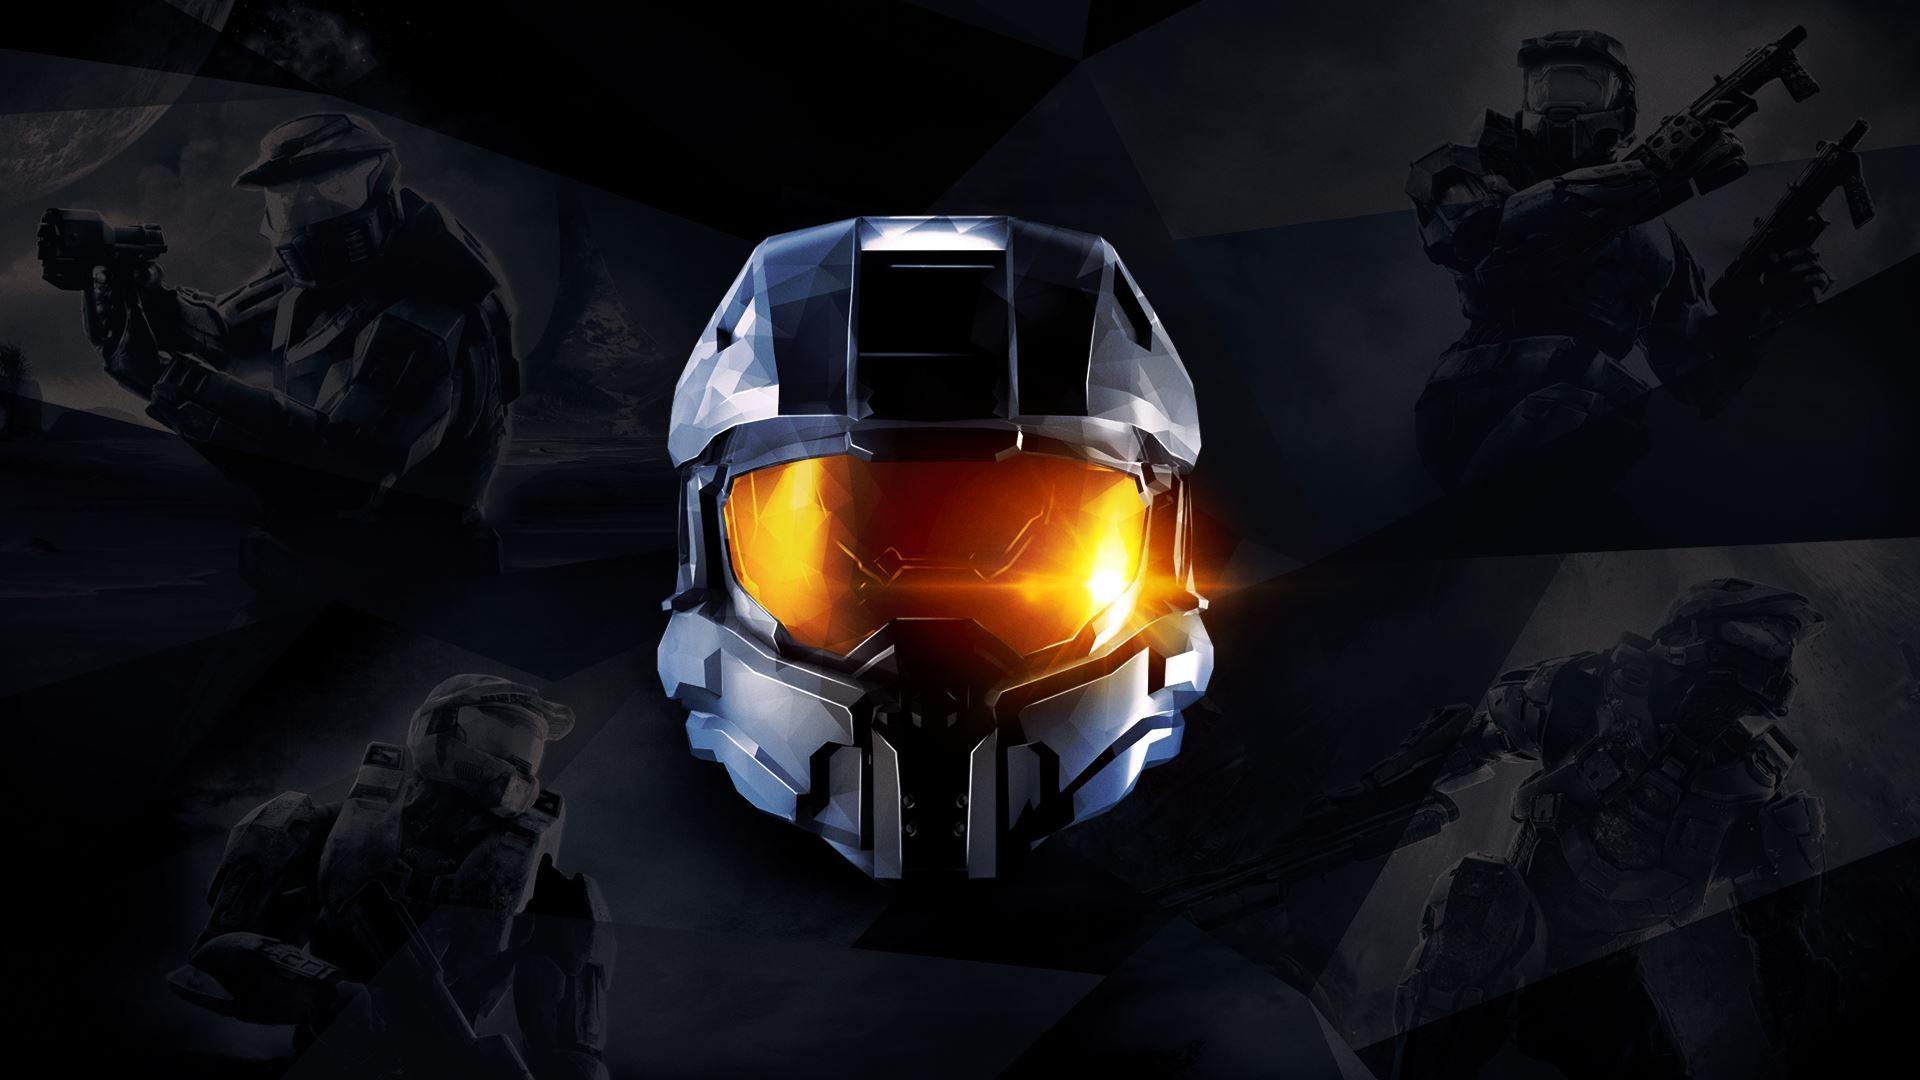 Wallpaper Illustration Vehicle Halo 5 Master Chief